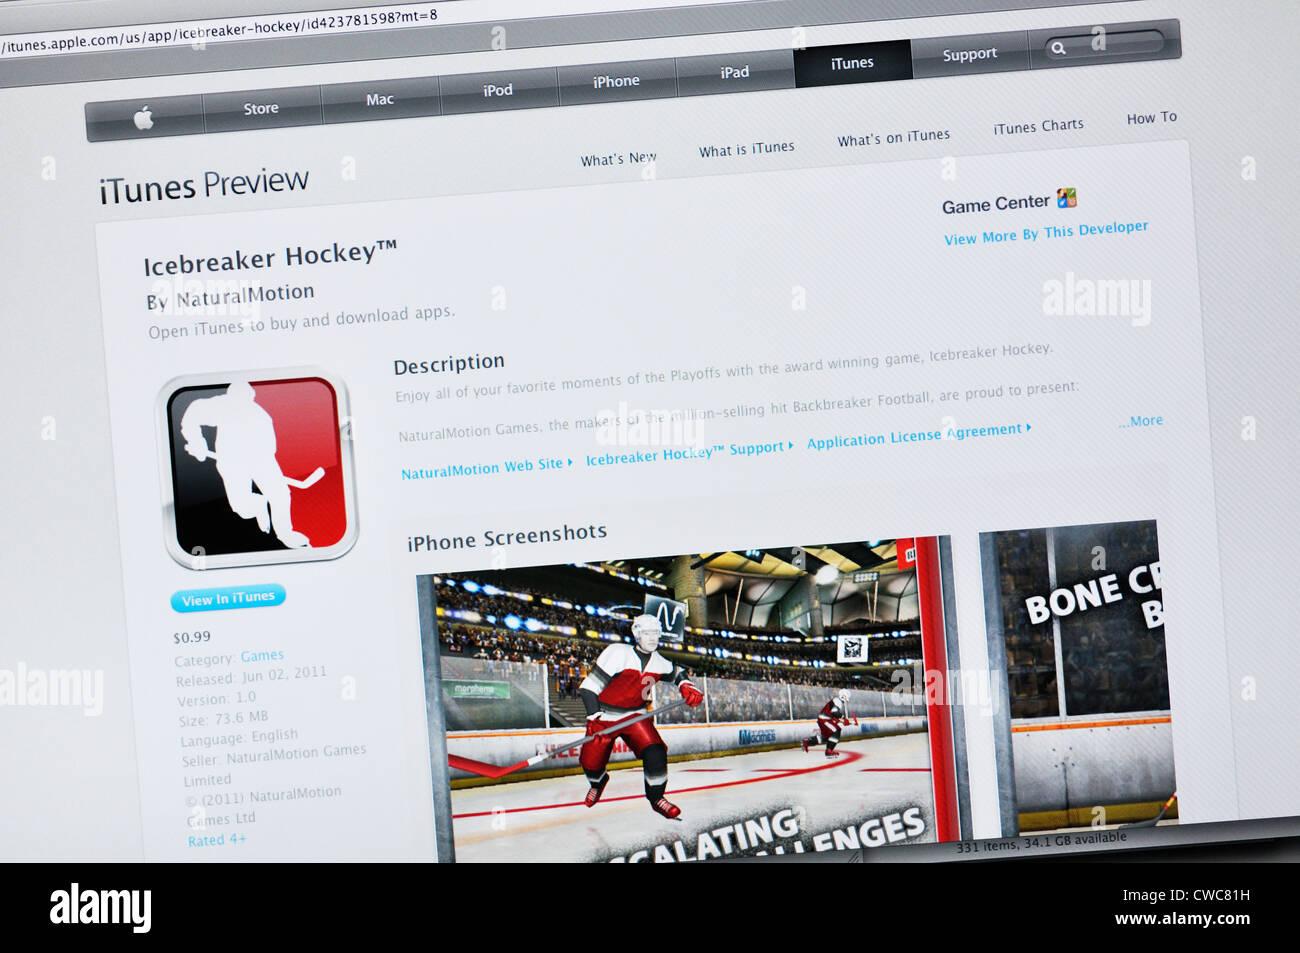 Icebreaker Hockey App Website Interactive Hockey Game Stock Photo